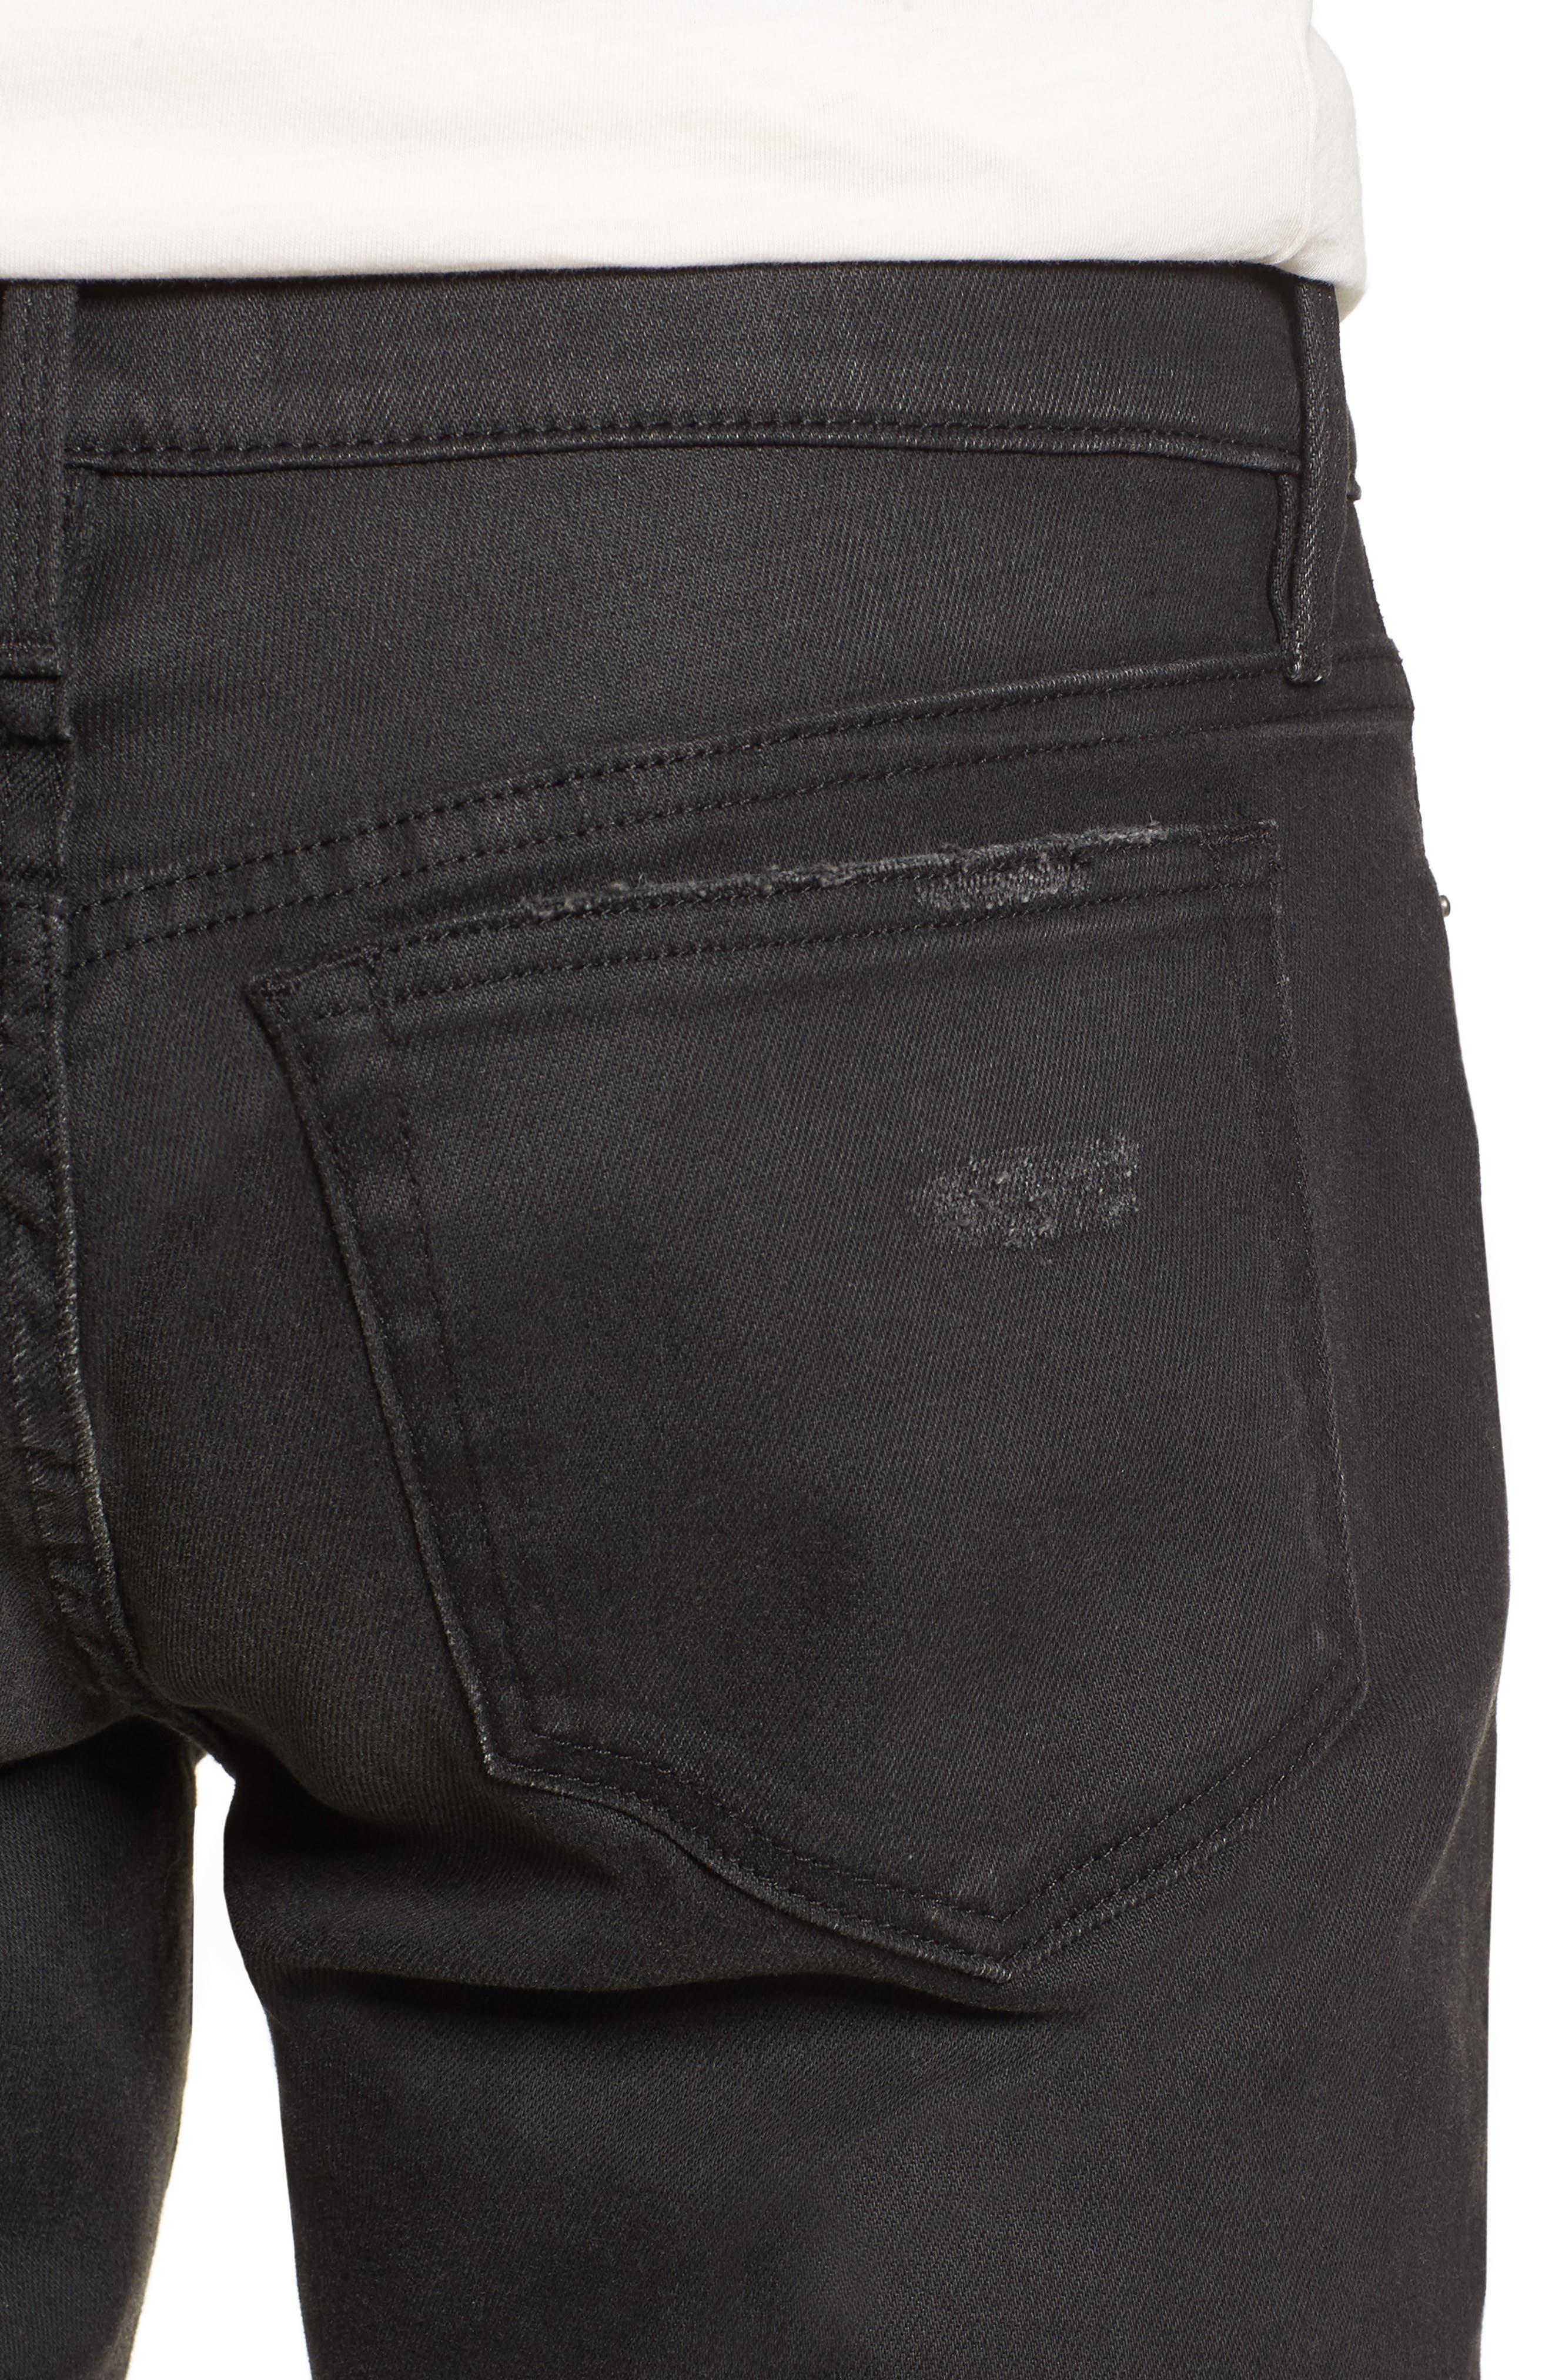 L'Homme Slim Fit Jeans,                             Alternate thumbnail 4, color,                             Flintwood